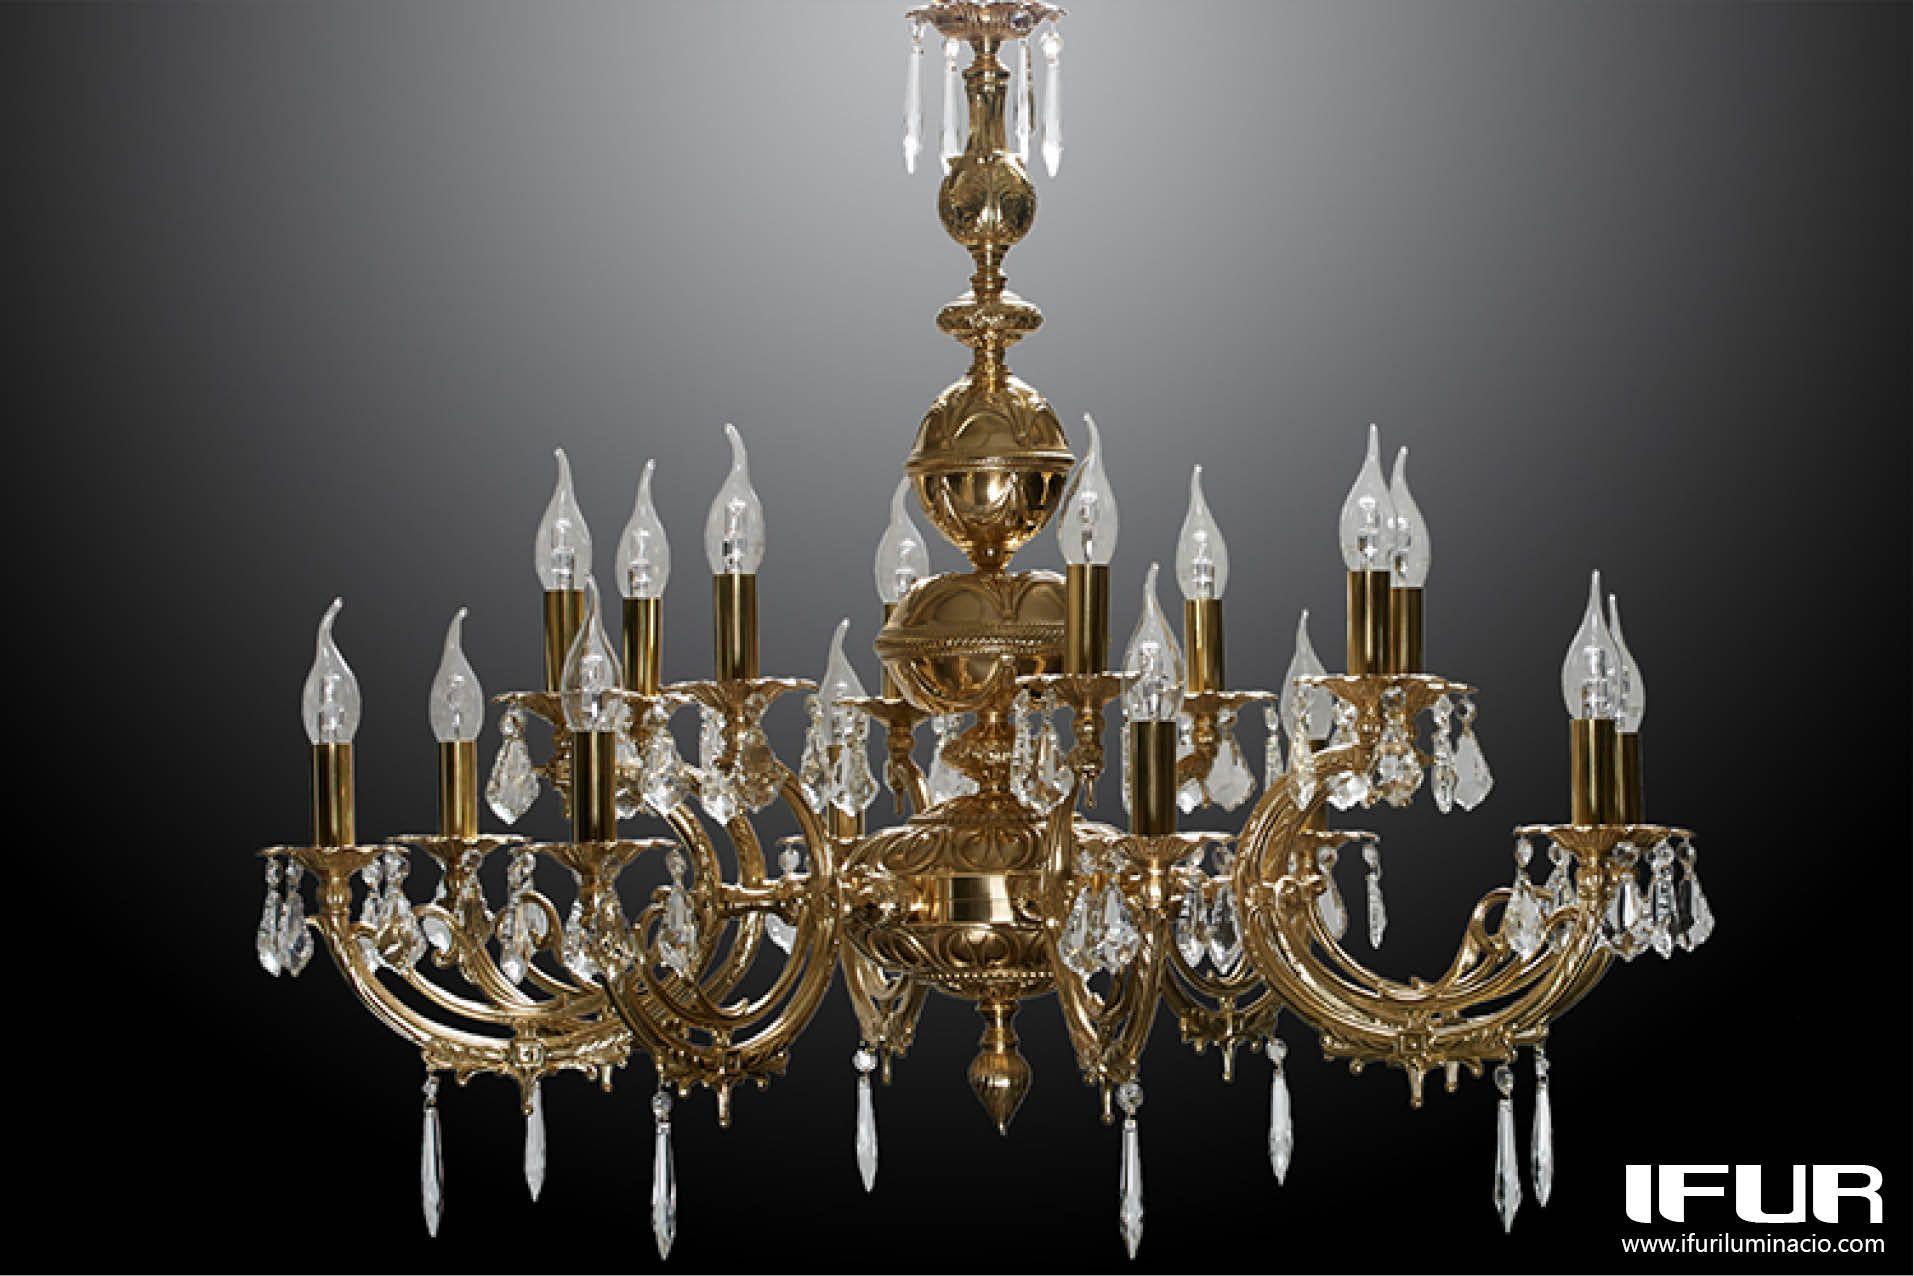 Custom made classic brass chandelier lmpara araa clsica de custom made classic brass chandelier lmpara araa clsica de bronce hecha a medida aloadofball Images